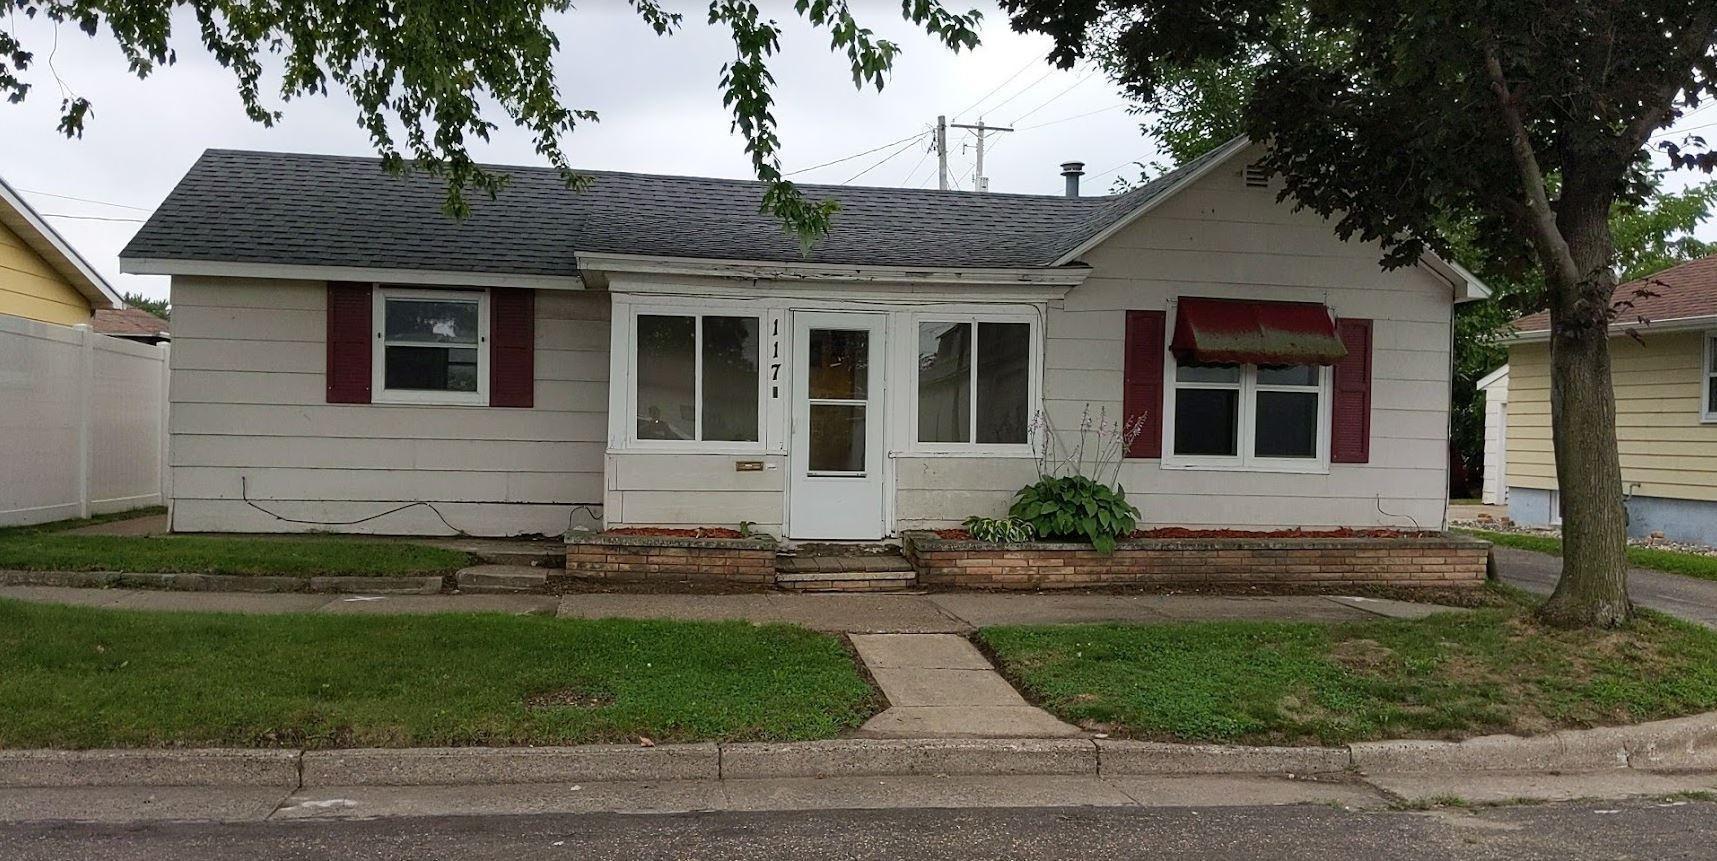 117 Chestnut Street, Winona, MN 55987